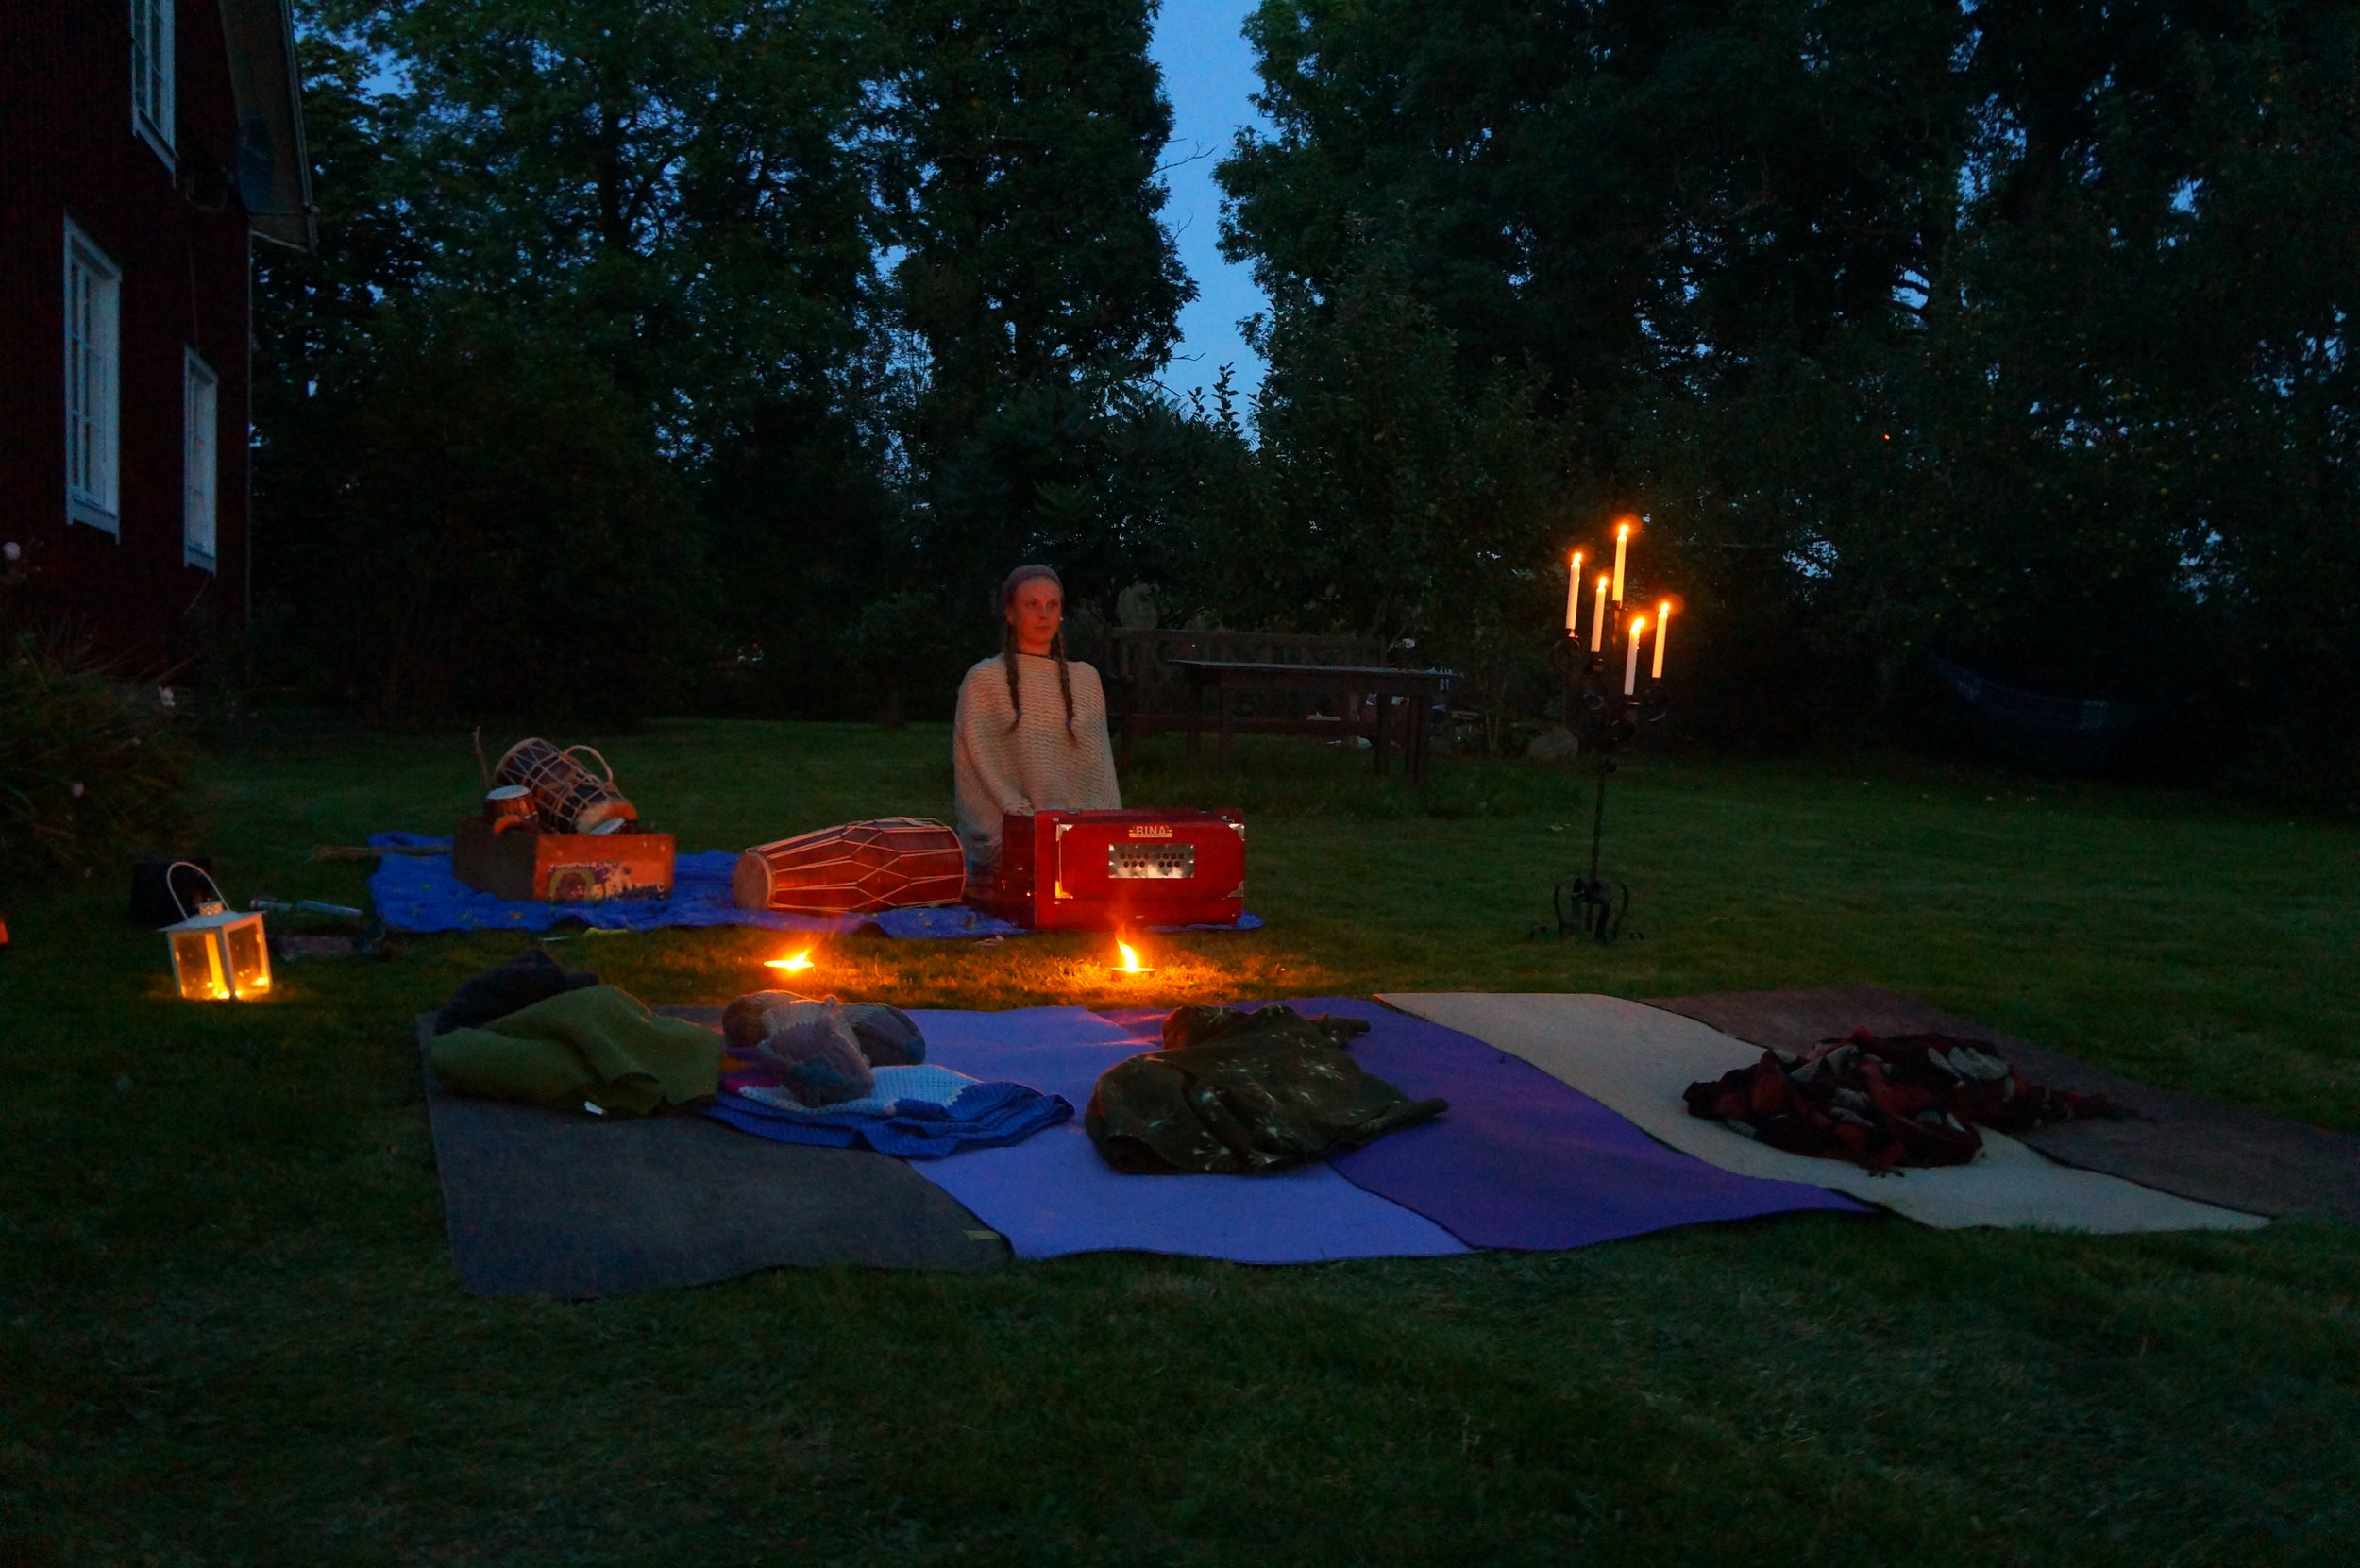 Sound Healing Meditation Yoga By Magie